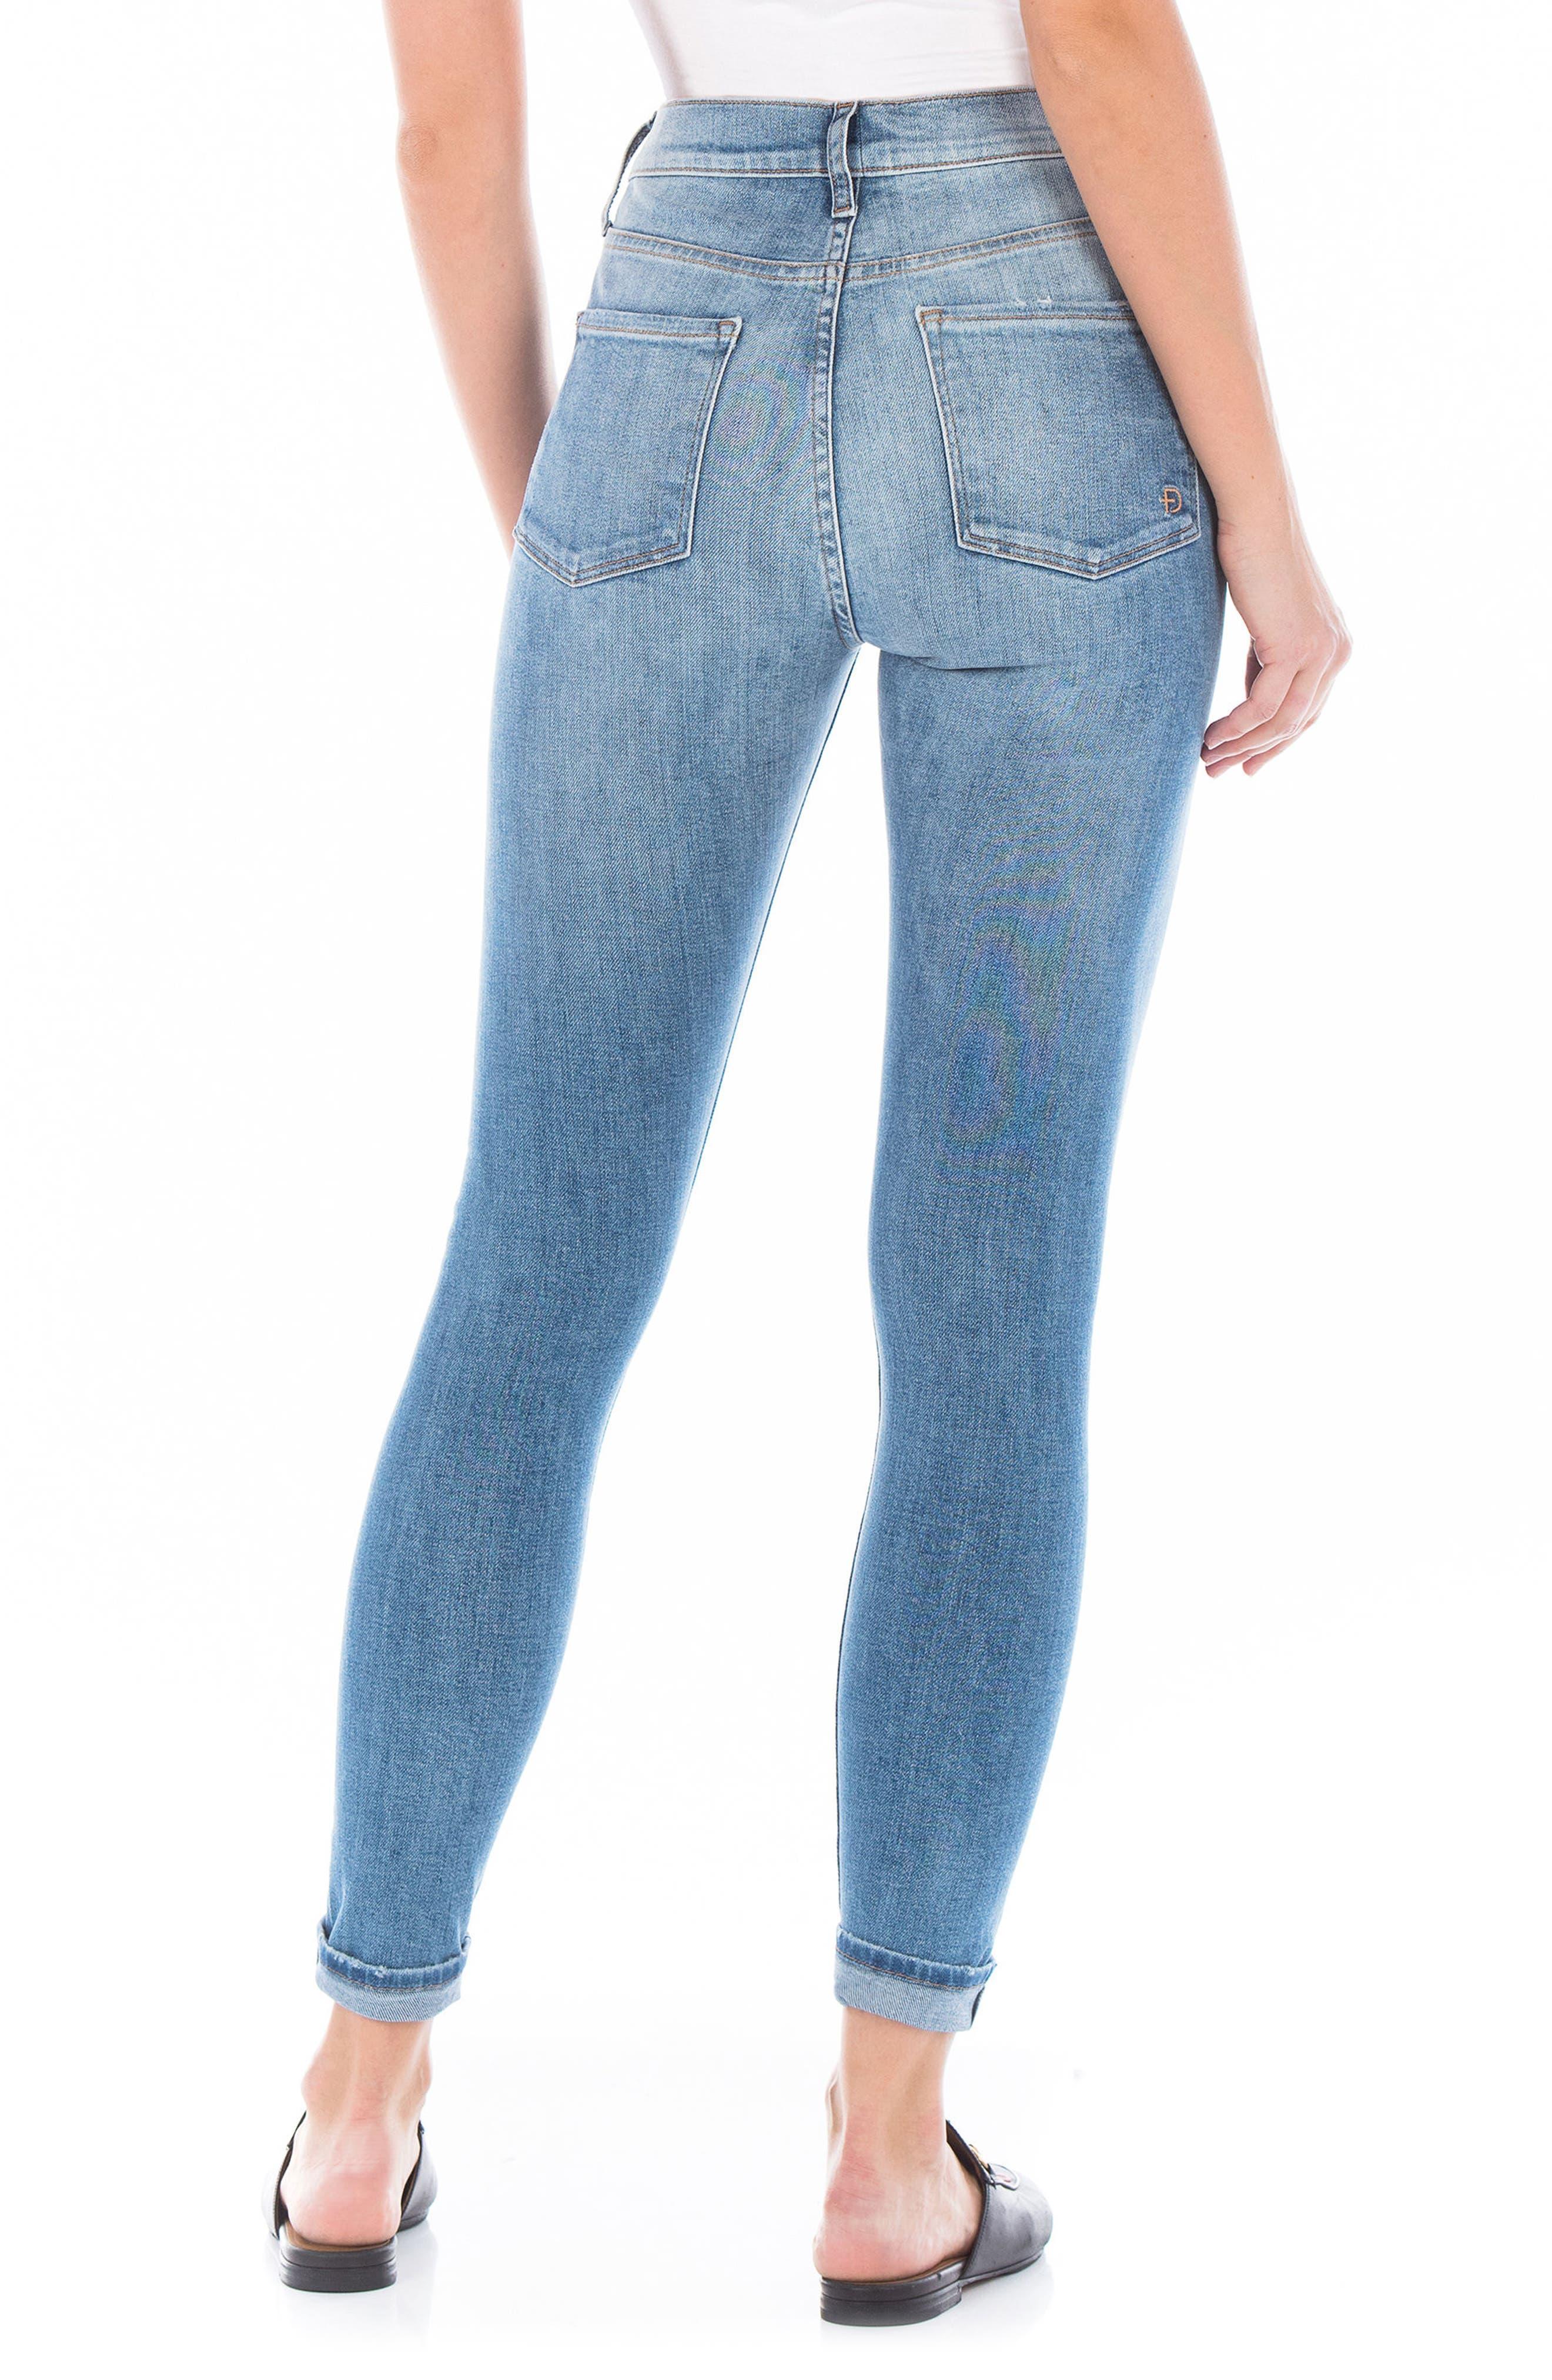 Gwen High Waist Skinny Jeans,                             Alternate thumbnail 2, color,                             76 SUMMER